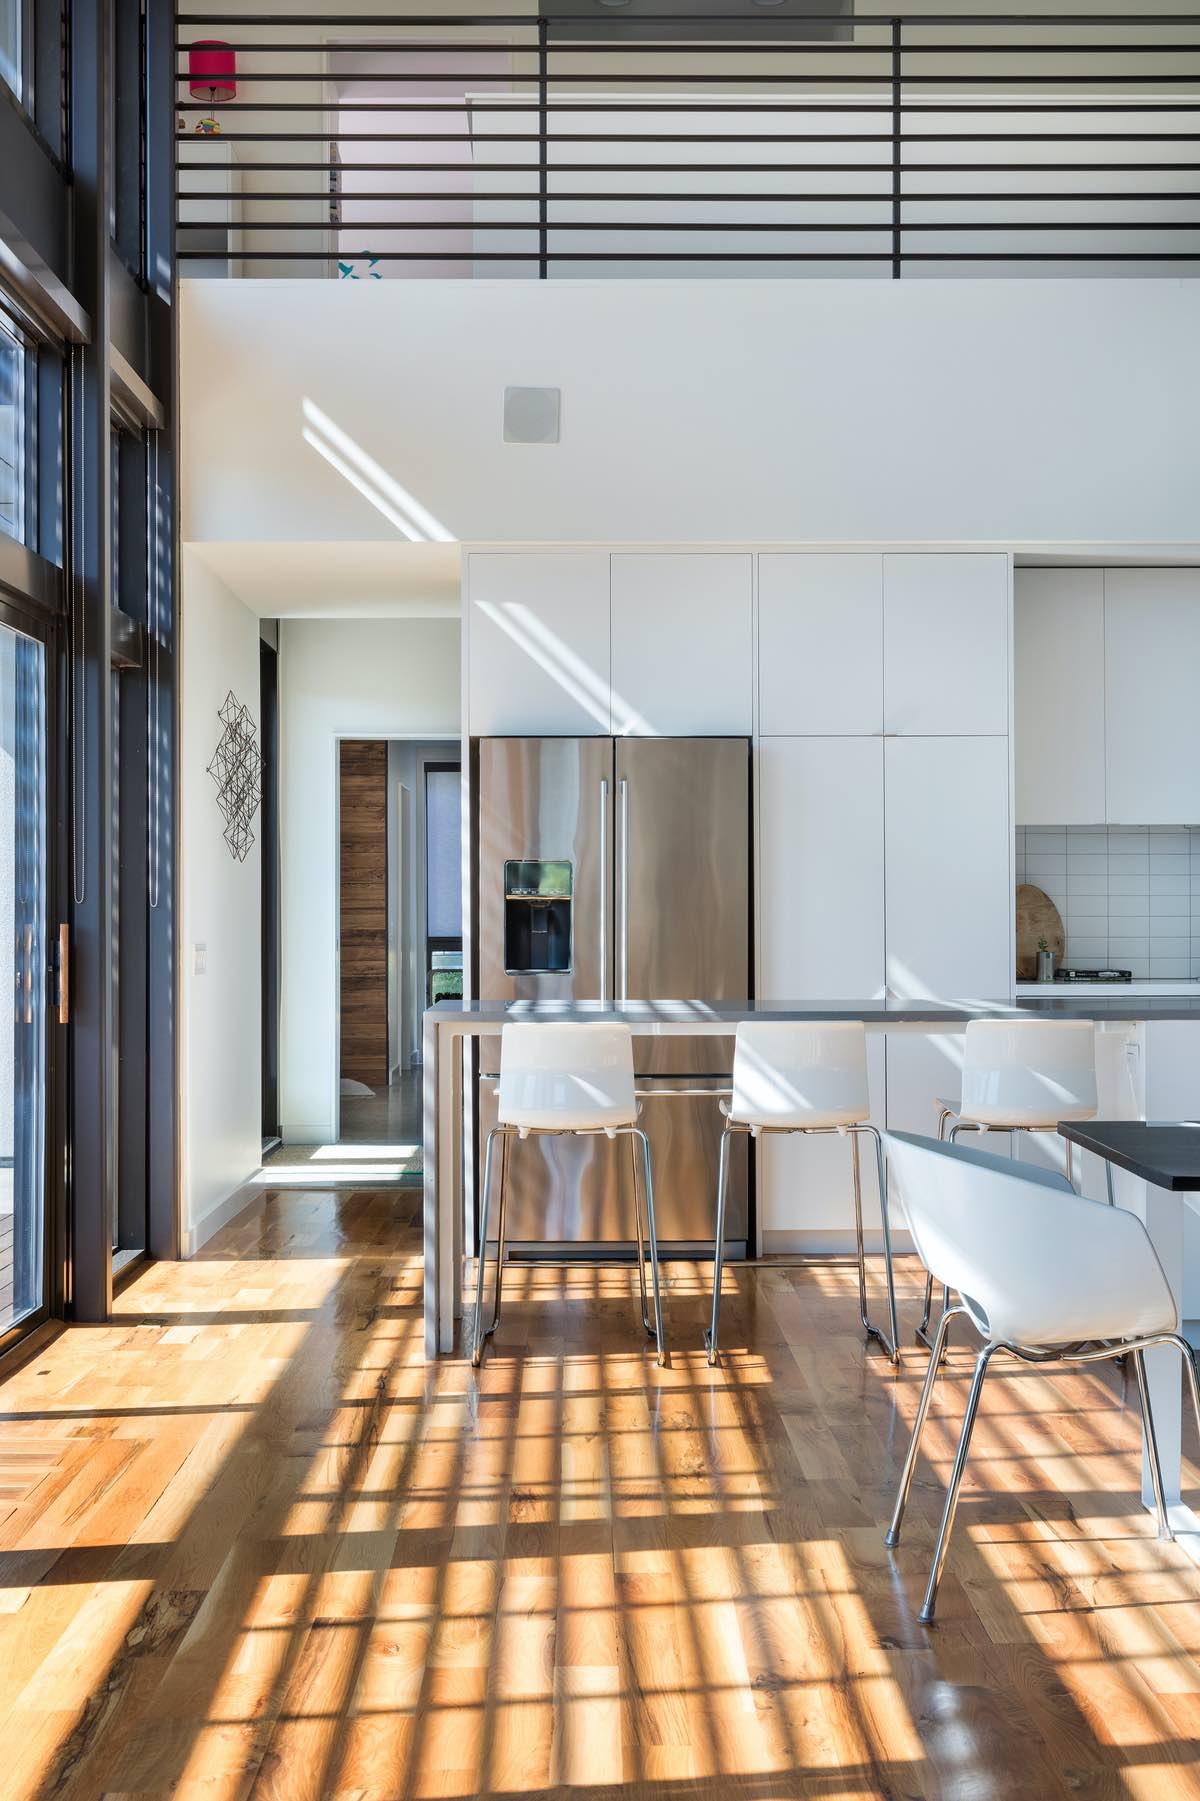 sun light entering the kitchen through window